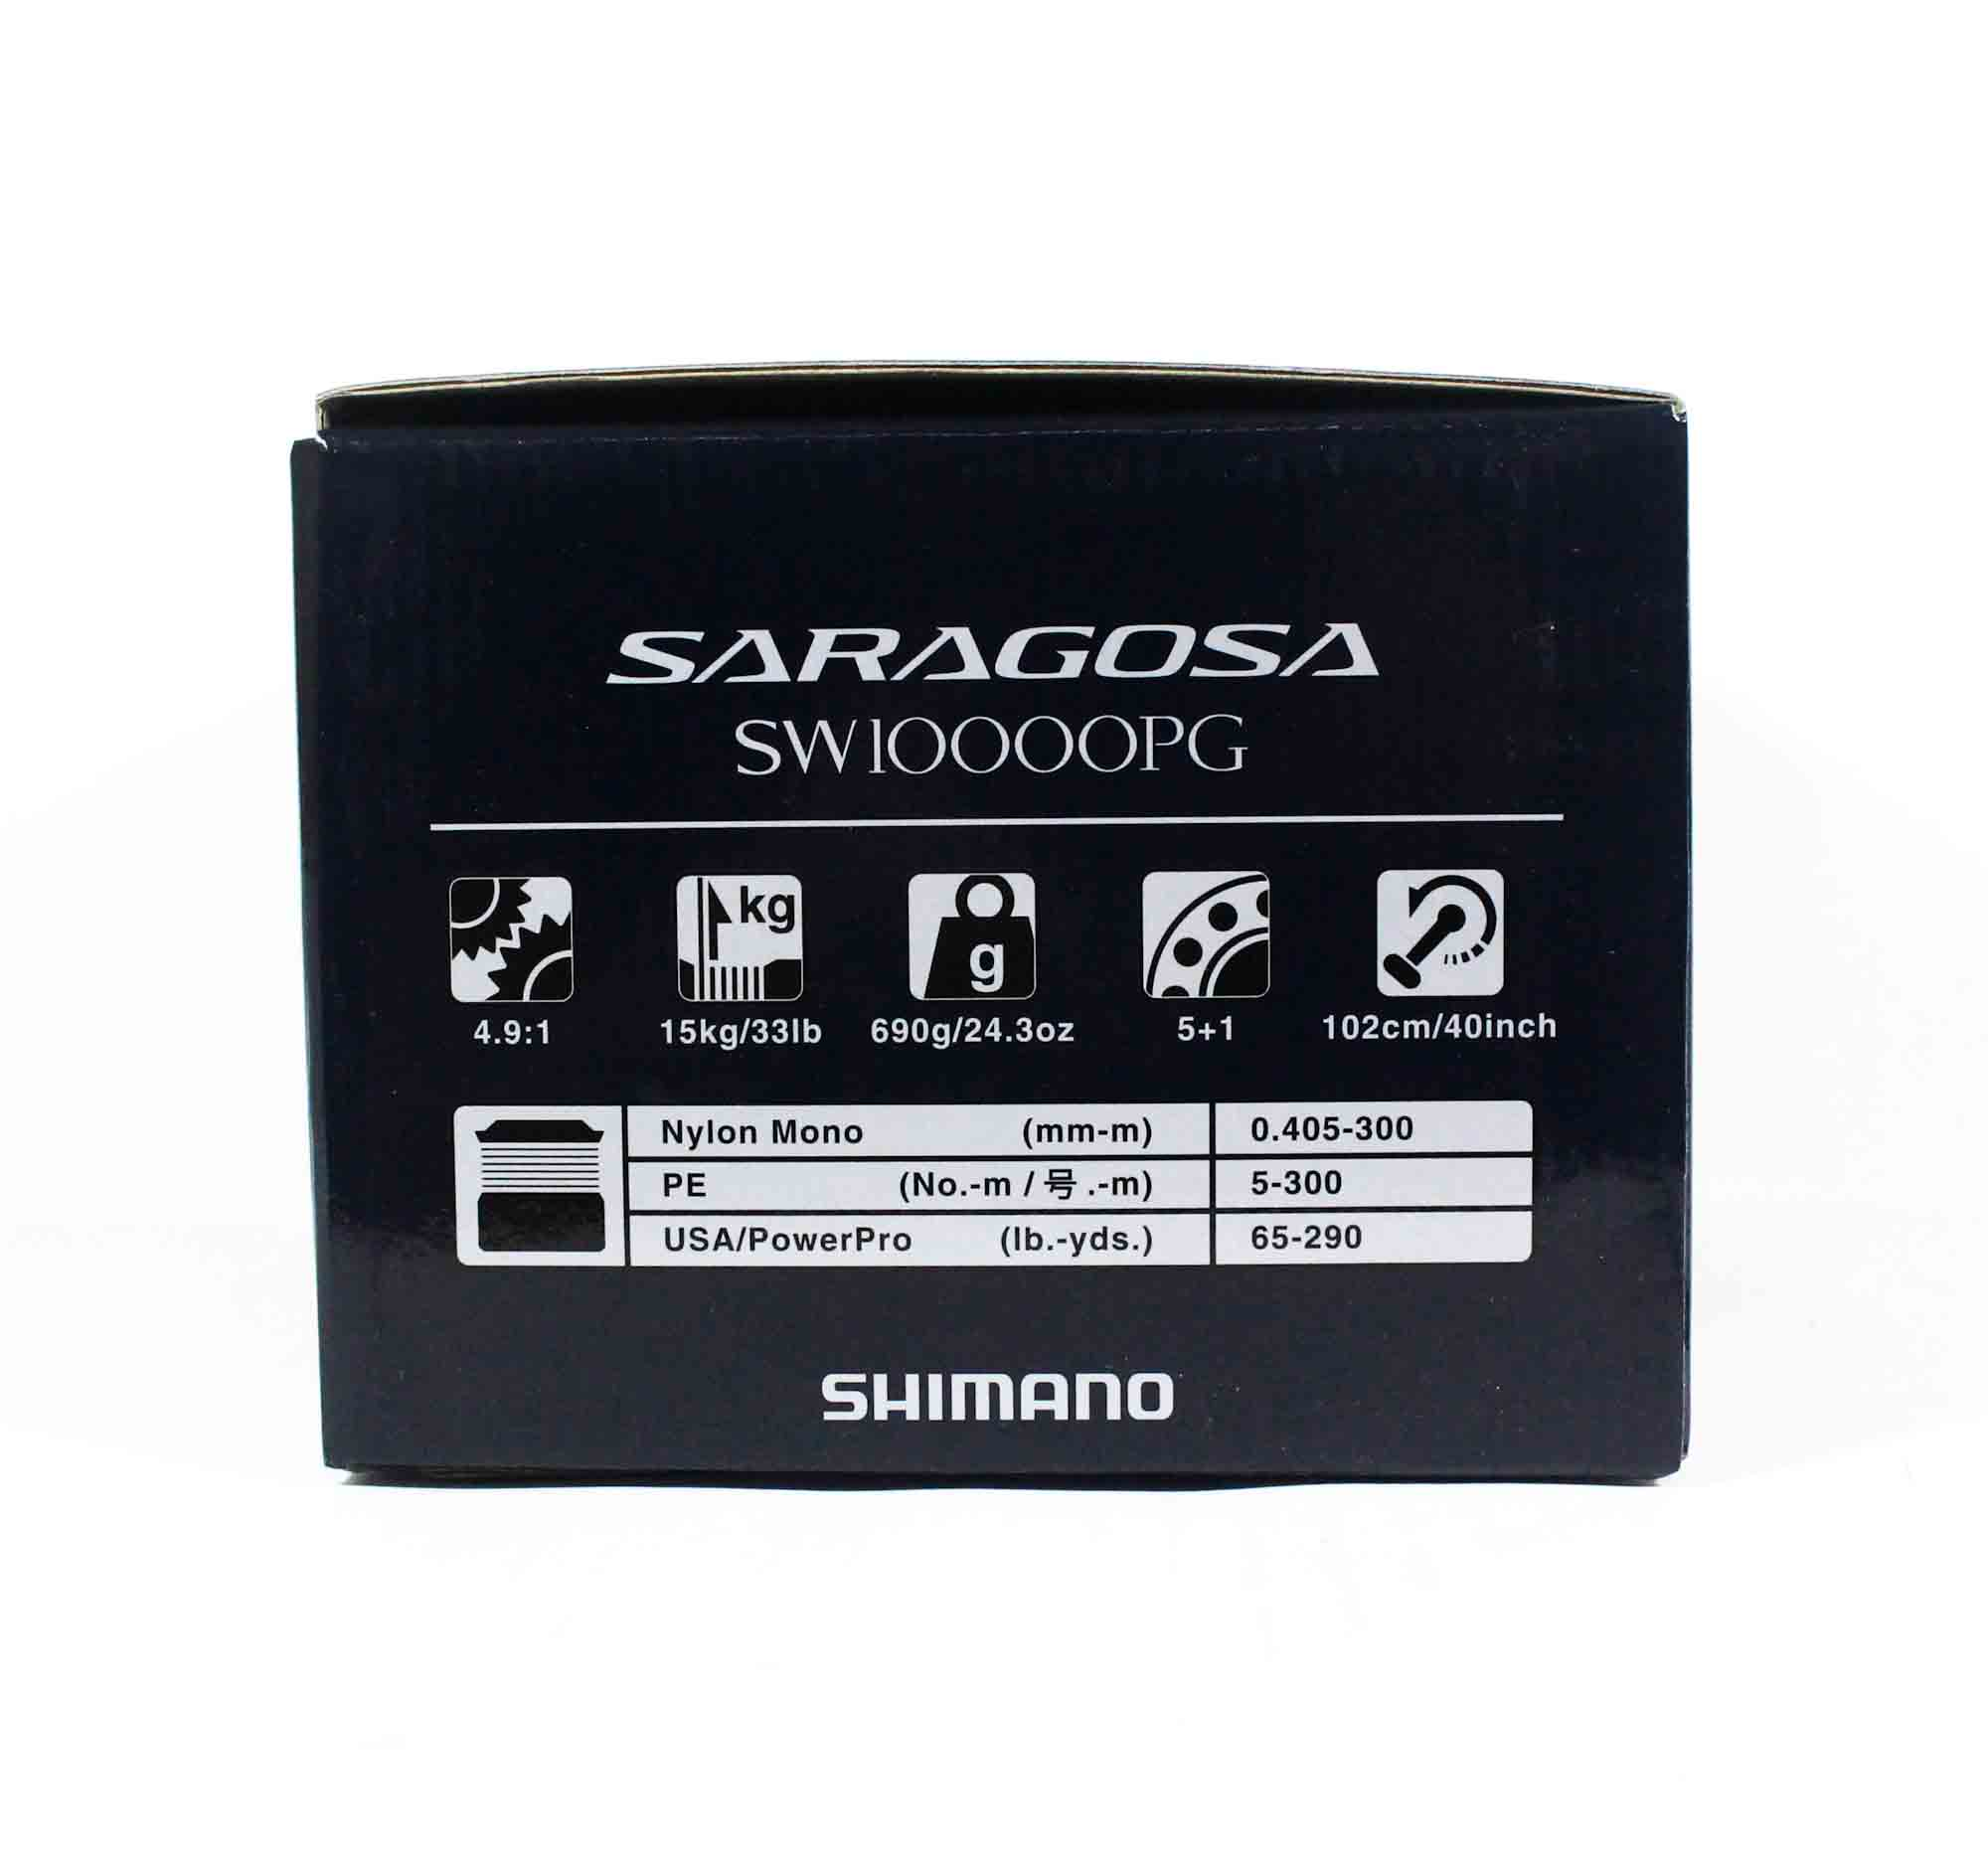 Shimano Reel Spinning Saragosa SRG10000SWAPG SW 10000 PG 2020 (0437)